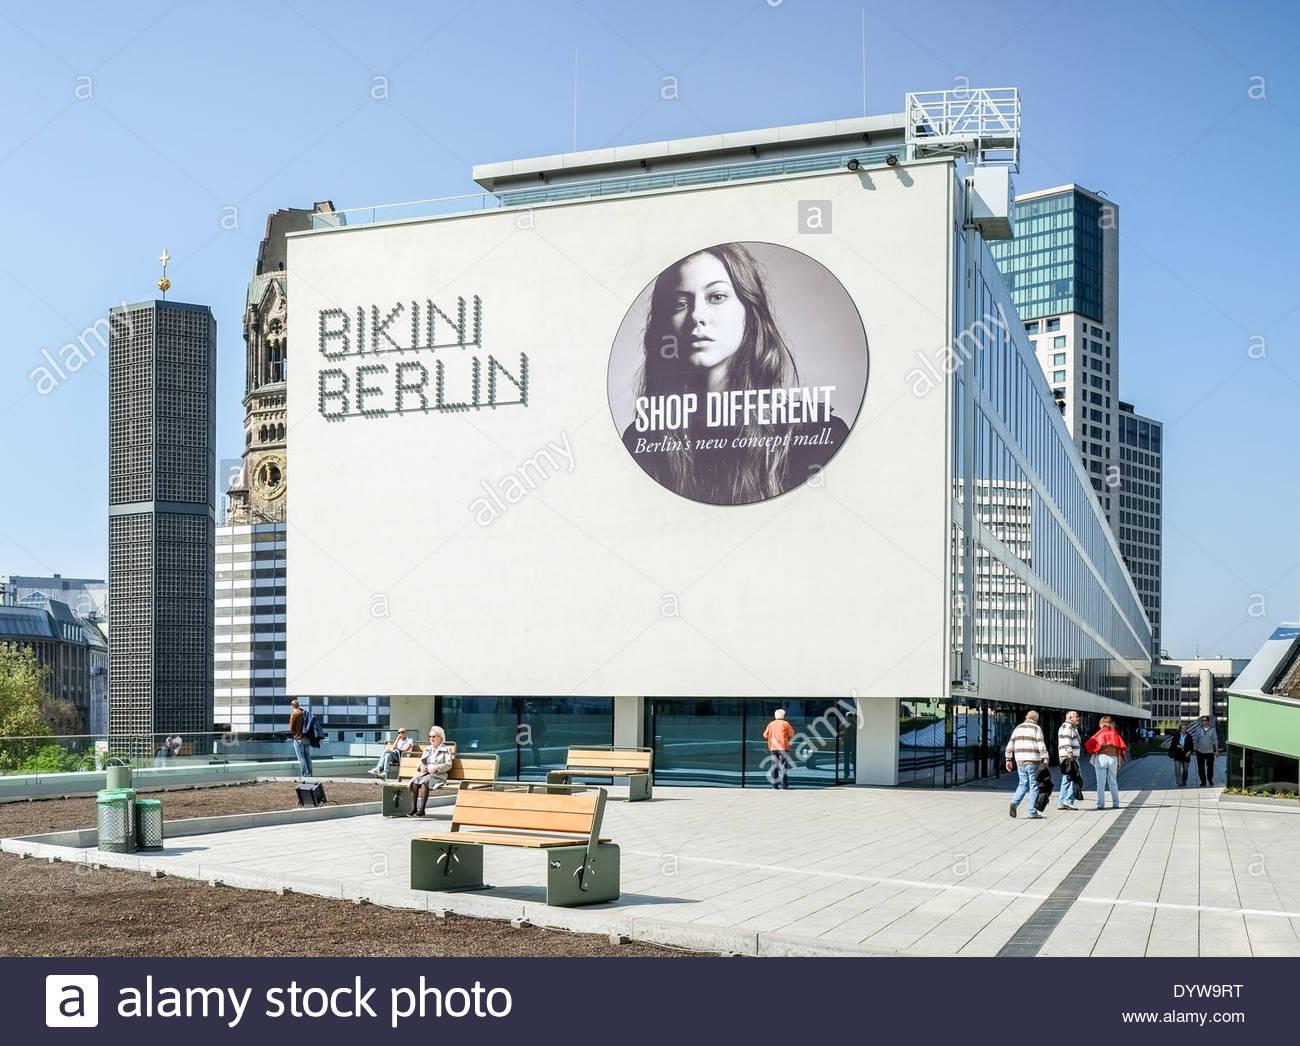 Berlin, Germany - the new shopping mall Bikini Haus - April 25, 2014 - Stock Image